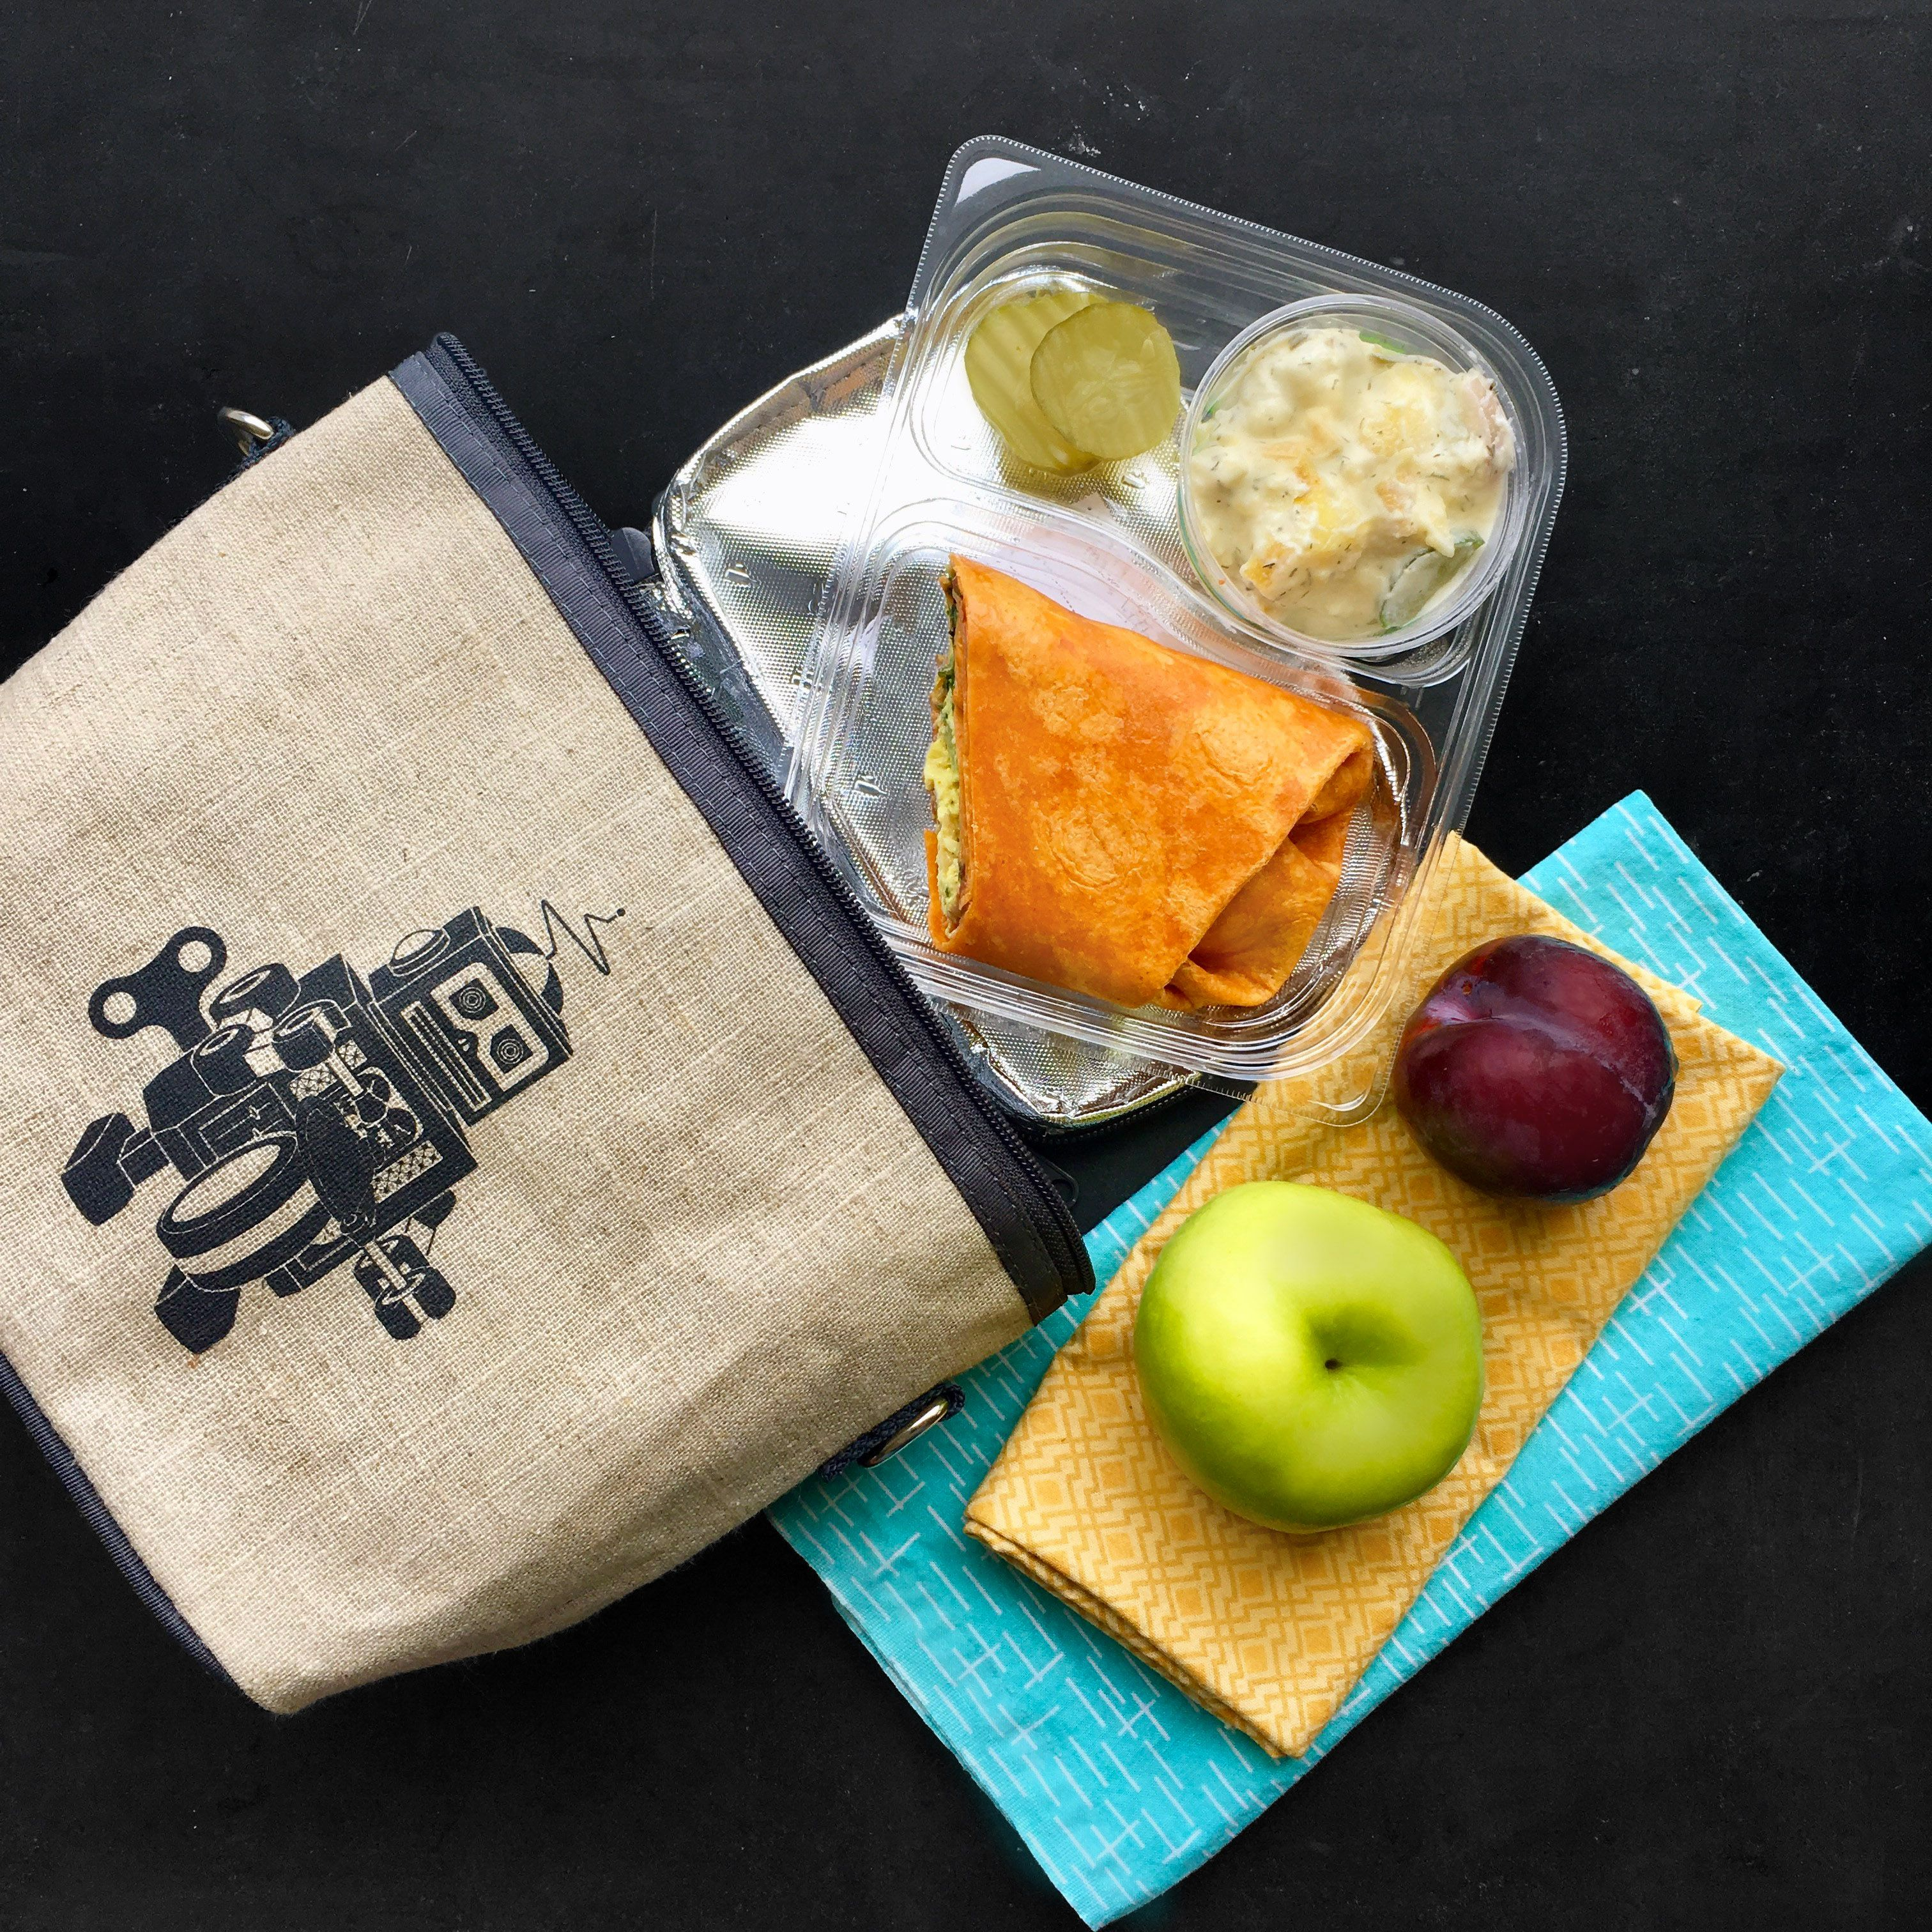 Café and Prepared Foods Food, Prepared foods, Turkey cheese